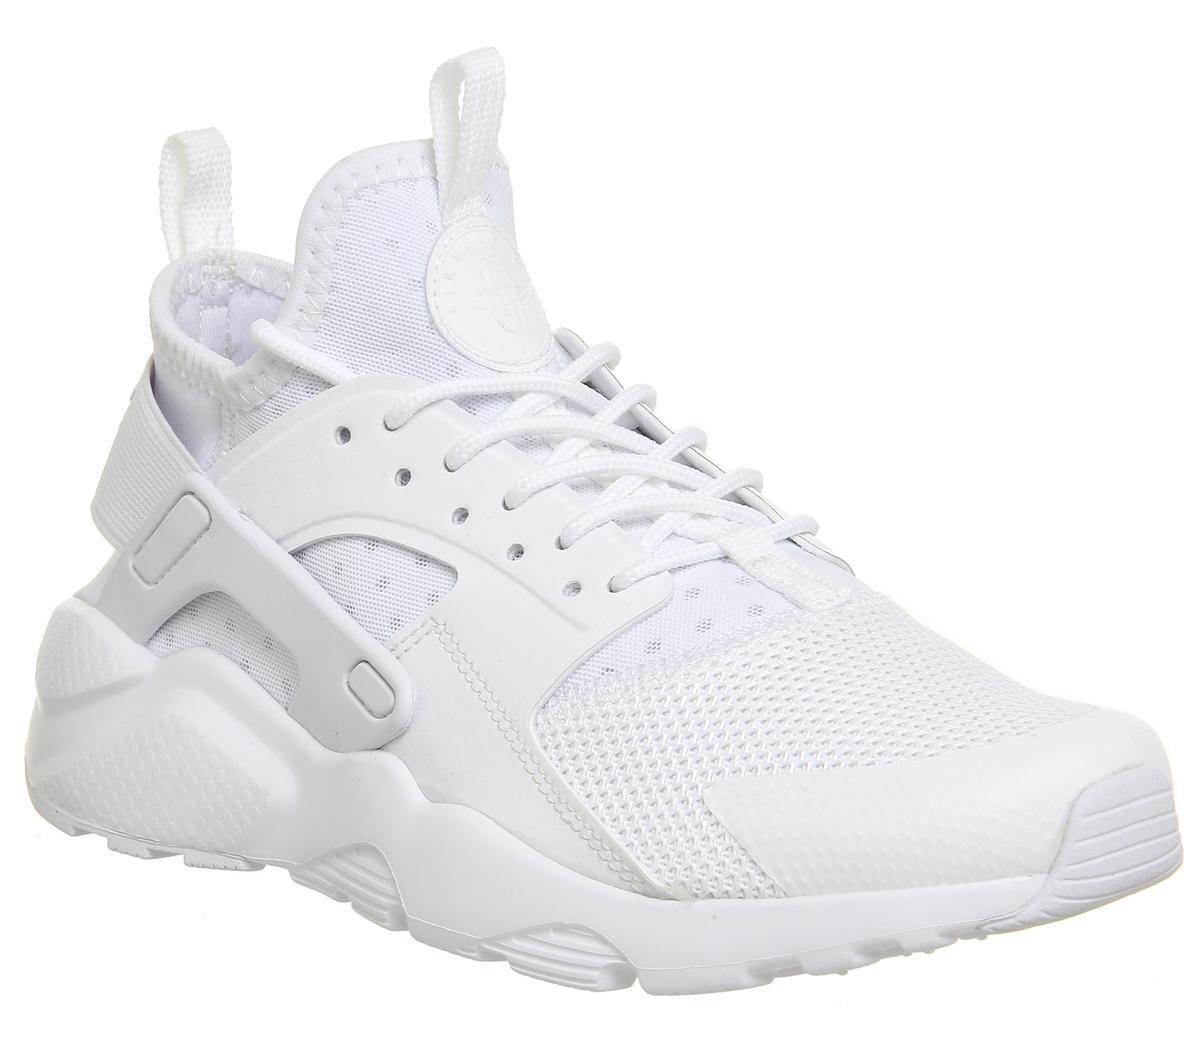 edificio Adelaide antibiotici  Nike Huarache Ultra Trainers White White White - Hers trainers